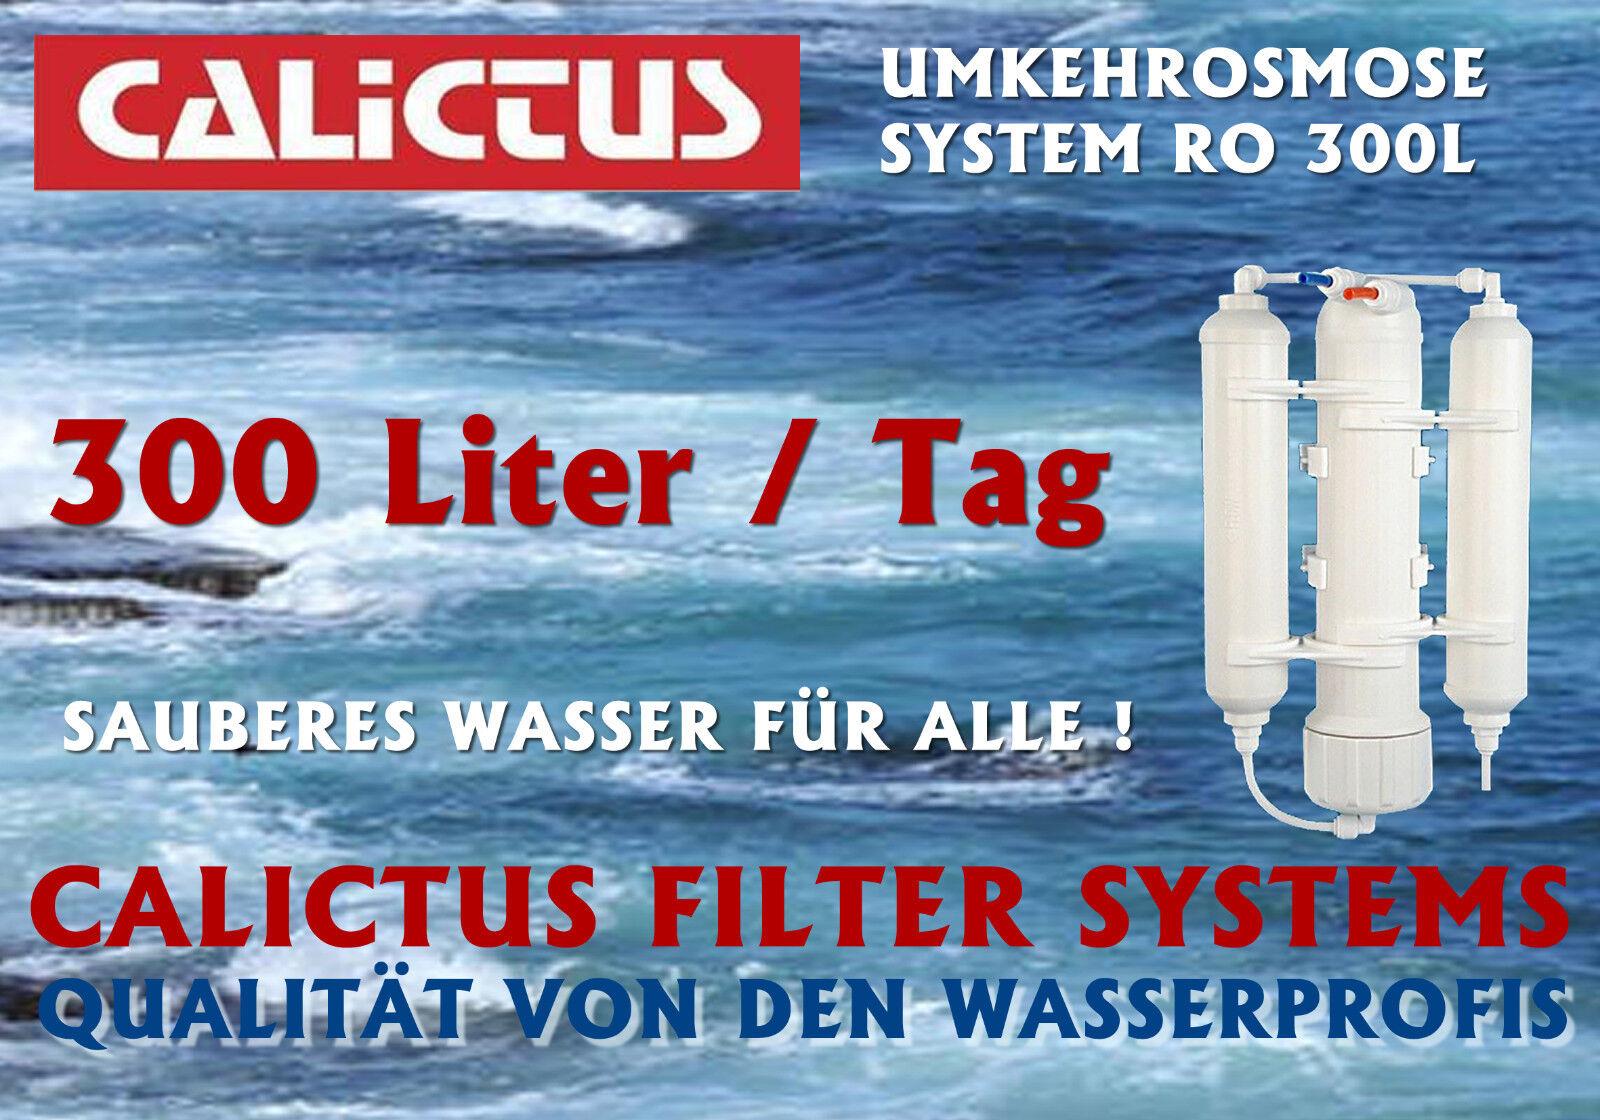 Osmoseanlage, Umkehrosmose, Osmosewasser selbst herstellen, Calictus 300 L   Tag